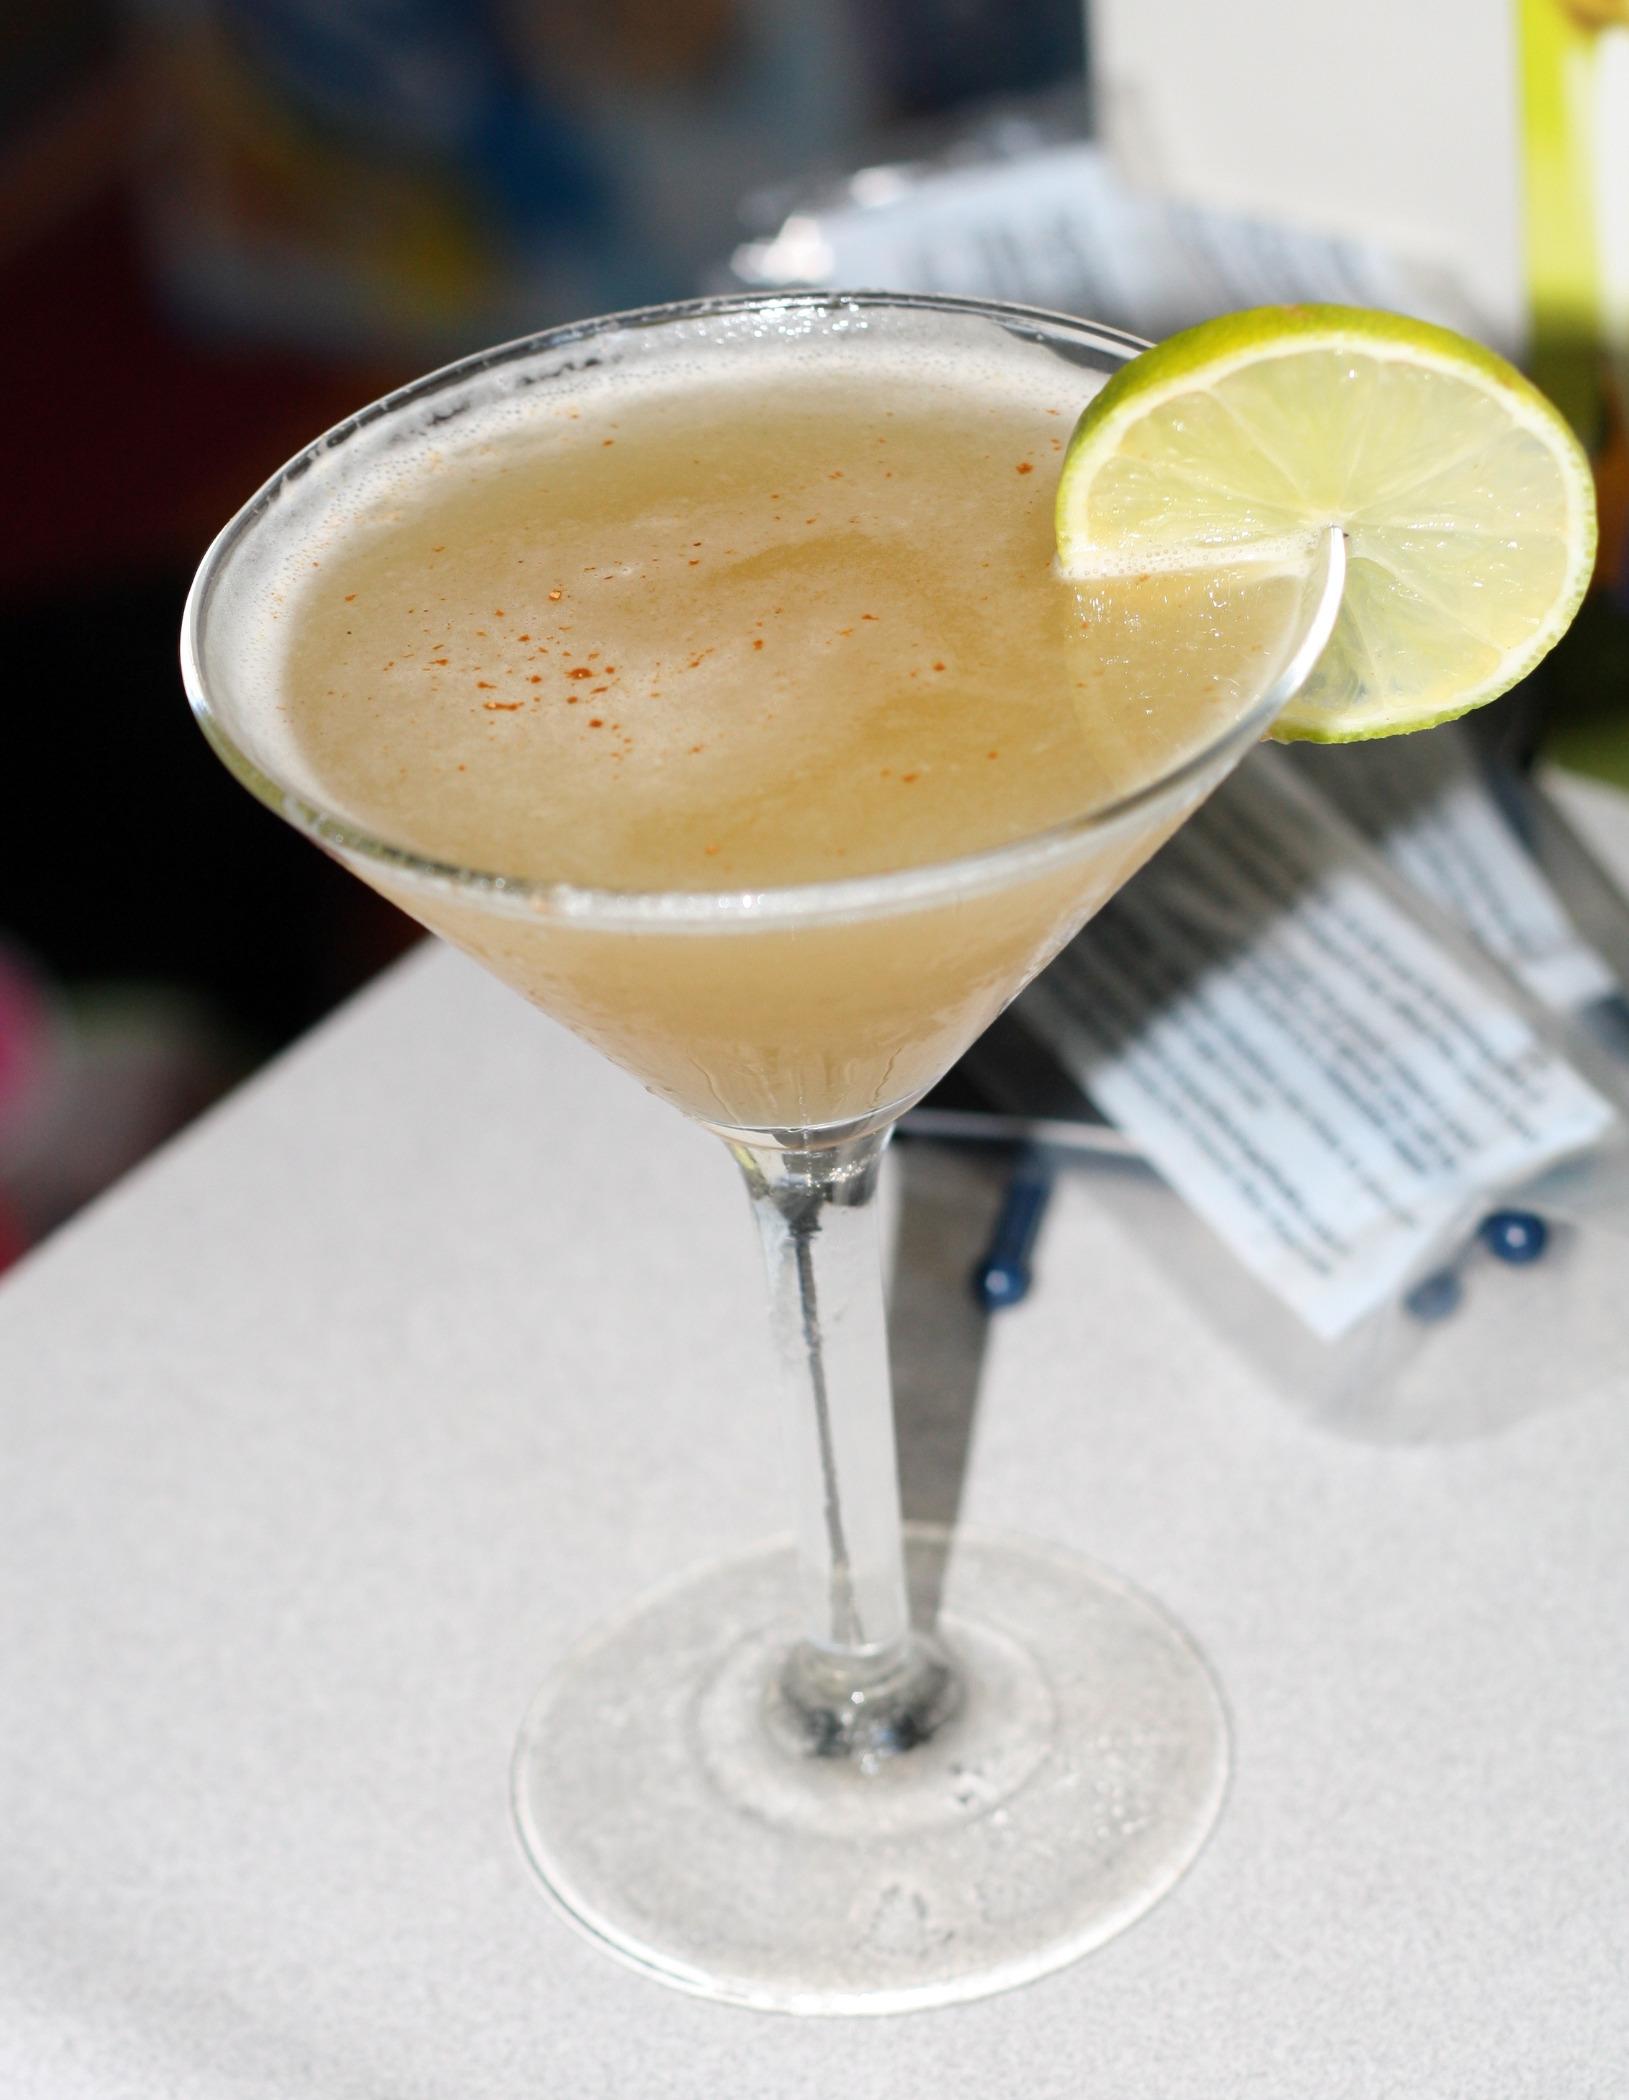 Honeymoon Brandy Cocktail Drink Recipe